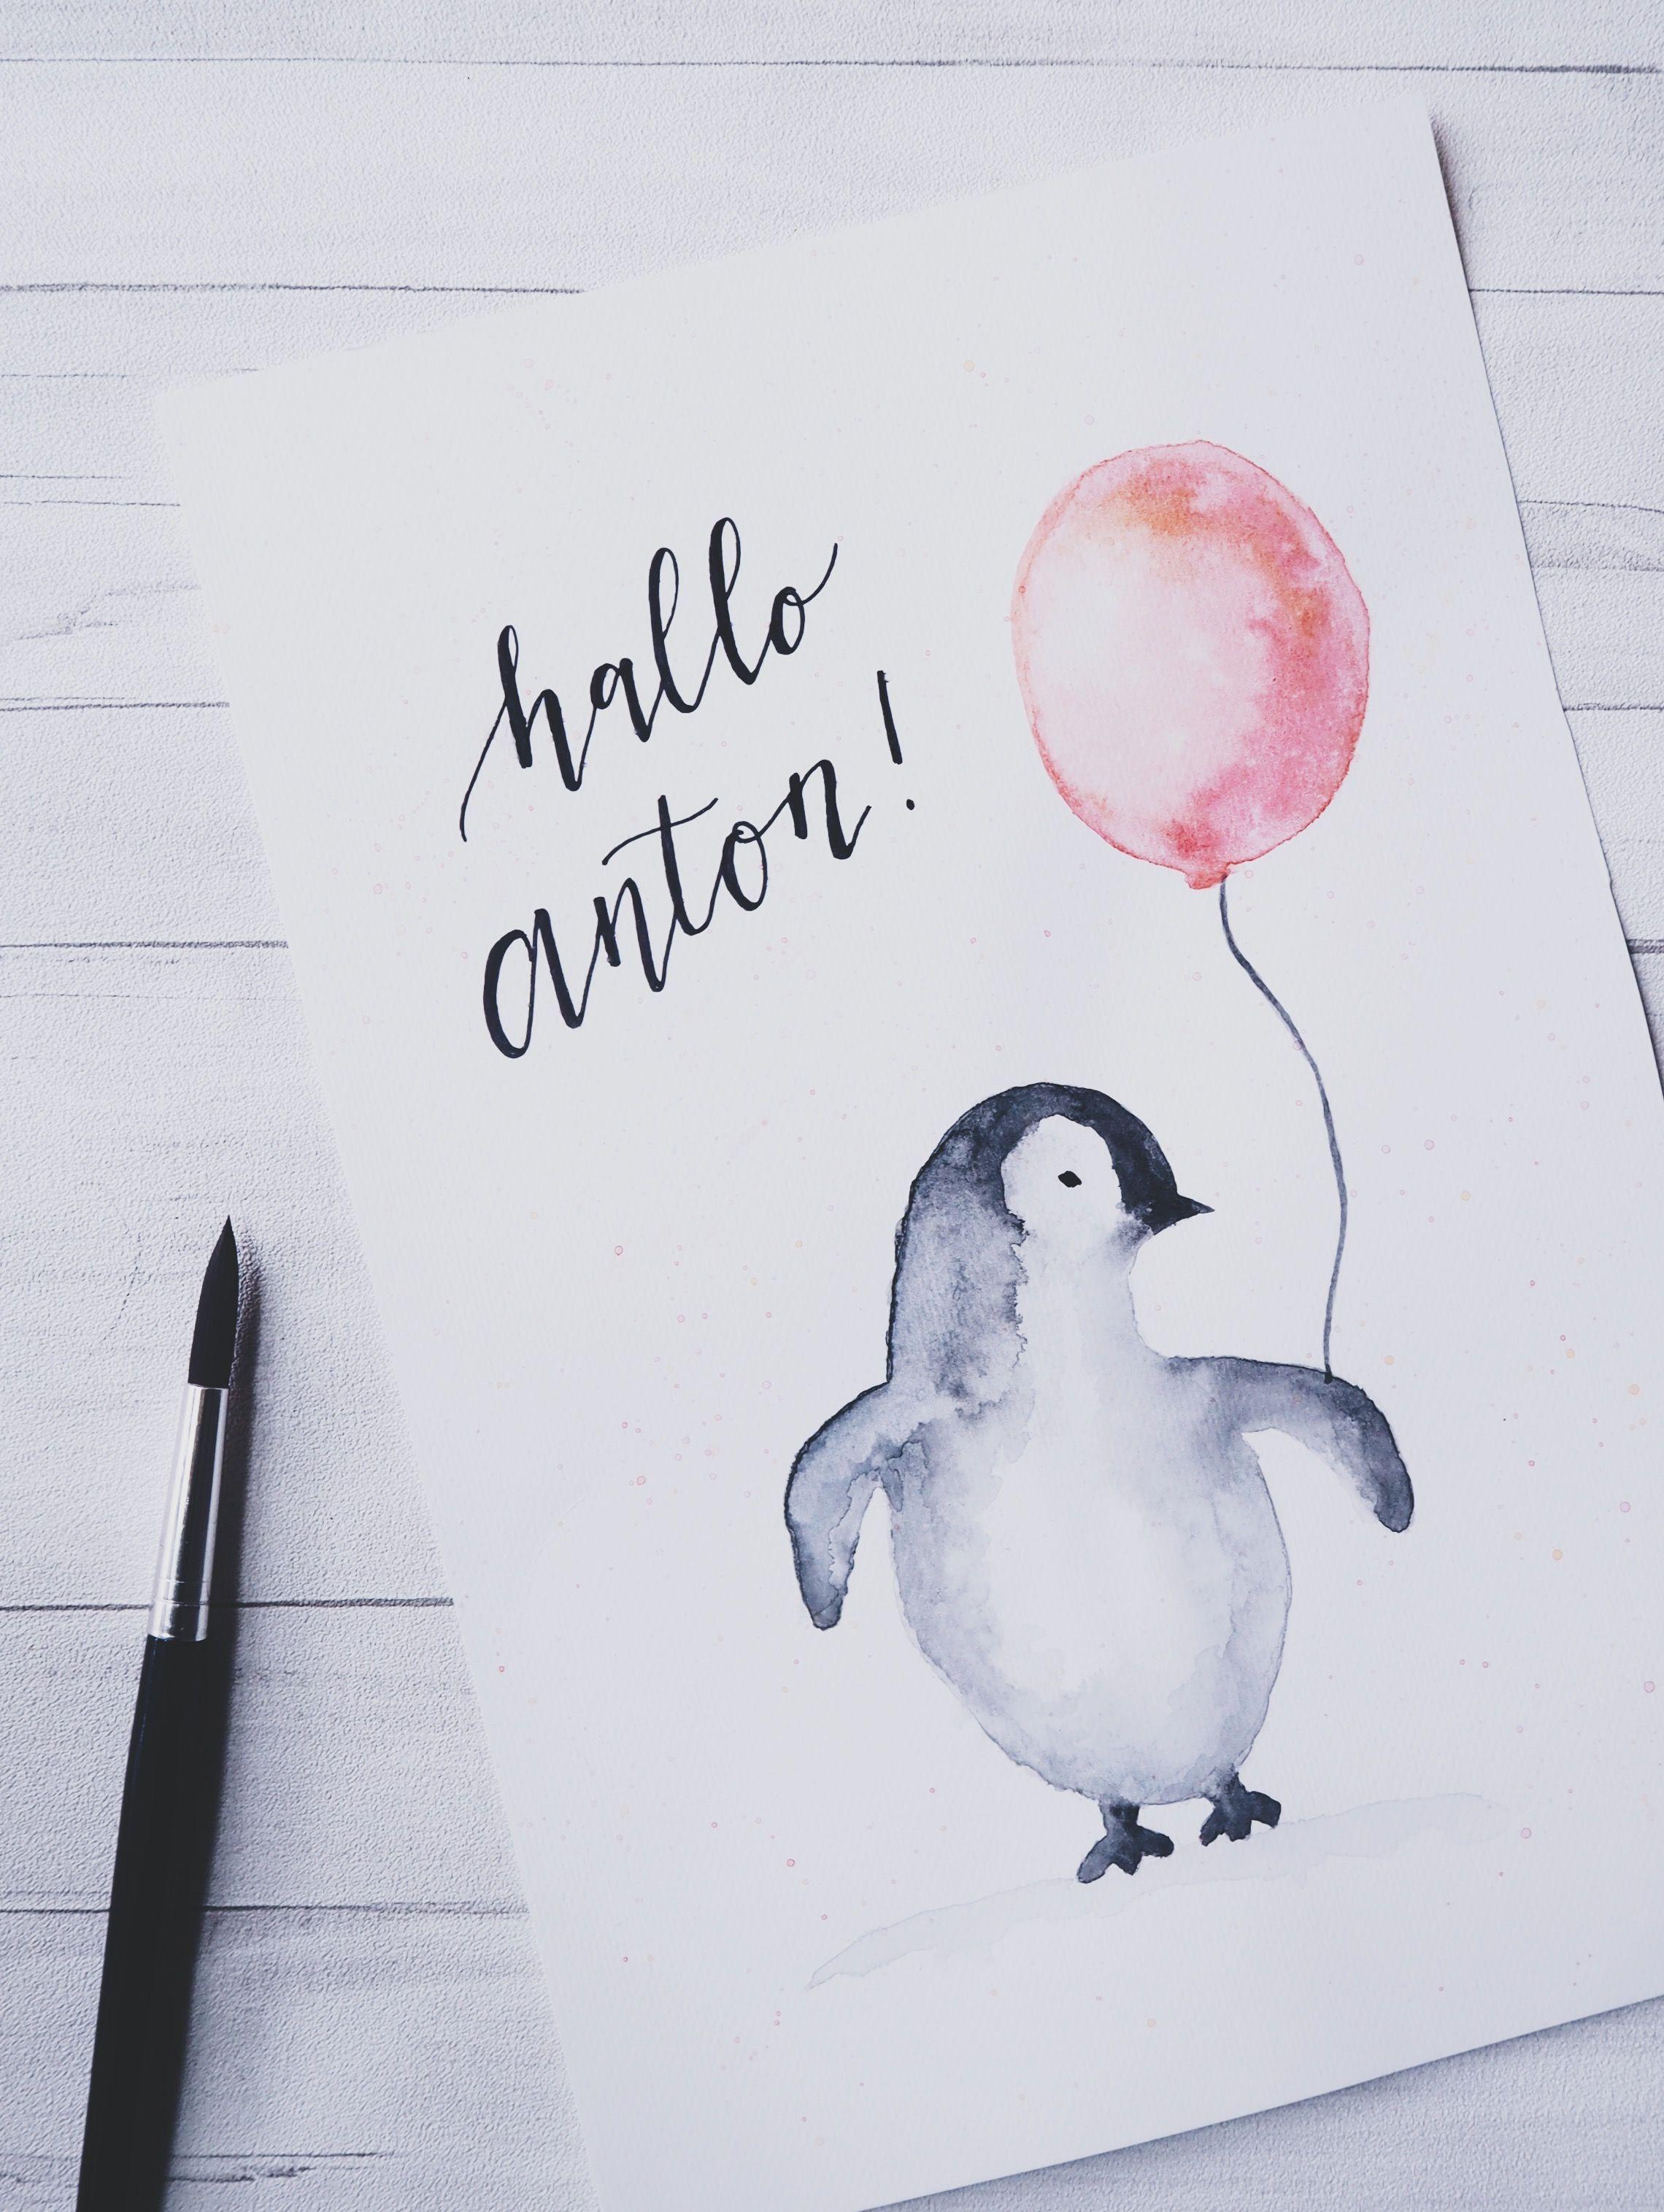 Baby Pinguin #diy #watercolor #watercolorpainting #aquarell #babyboy #handlettering #fauxcalligraphy #maskingtapeart Baby Pinguin #diy #watercolor #watercolorpainting #aquarell #babyboy #handlettering #fauxcalligraphy